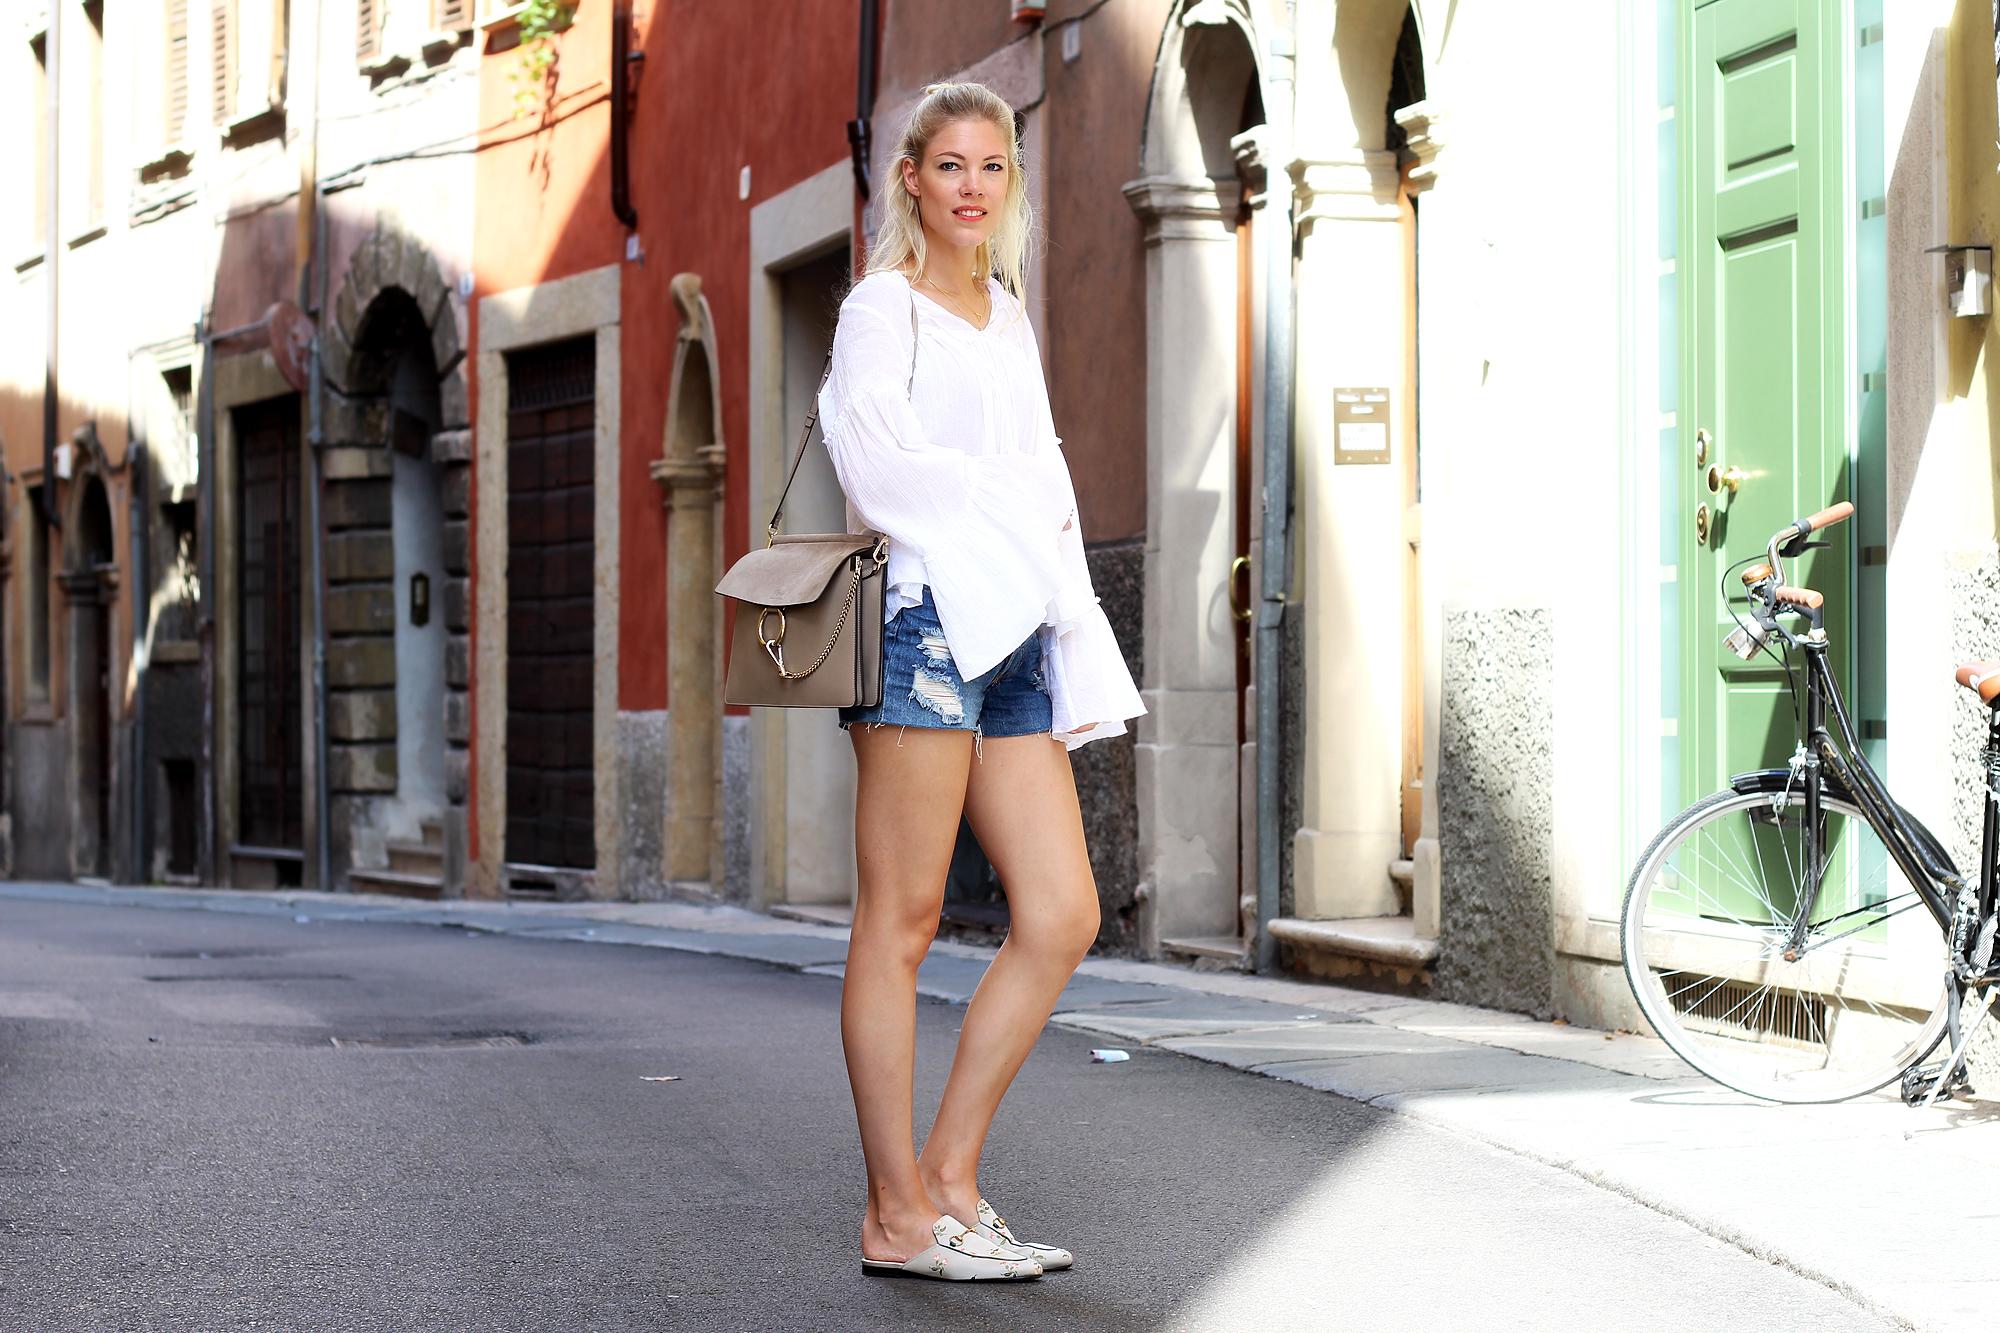 somehappyshoes_fashionblog_gucci_chloe_verona